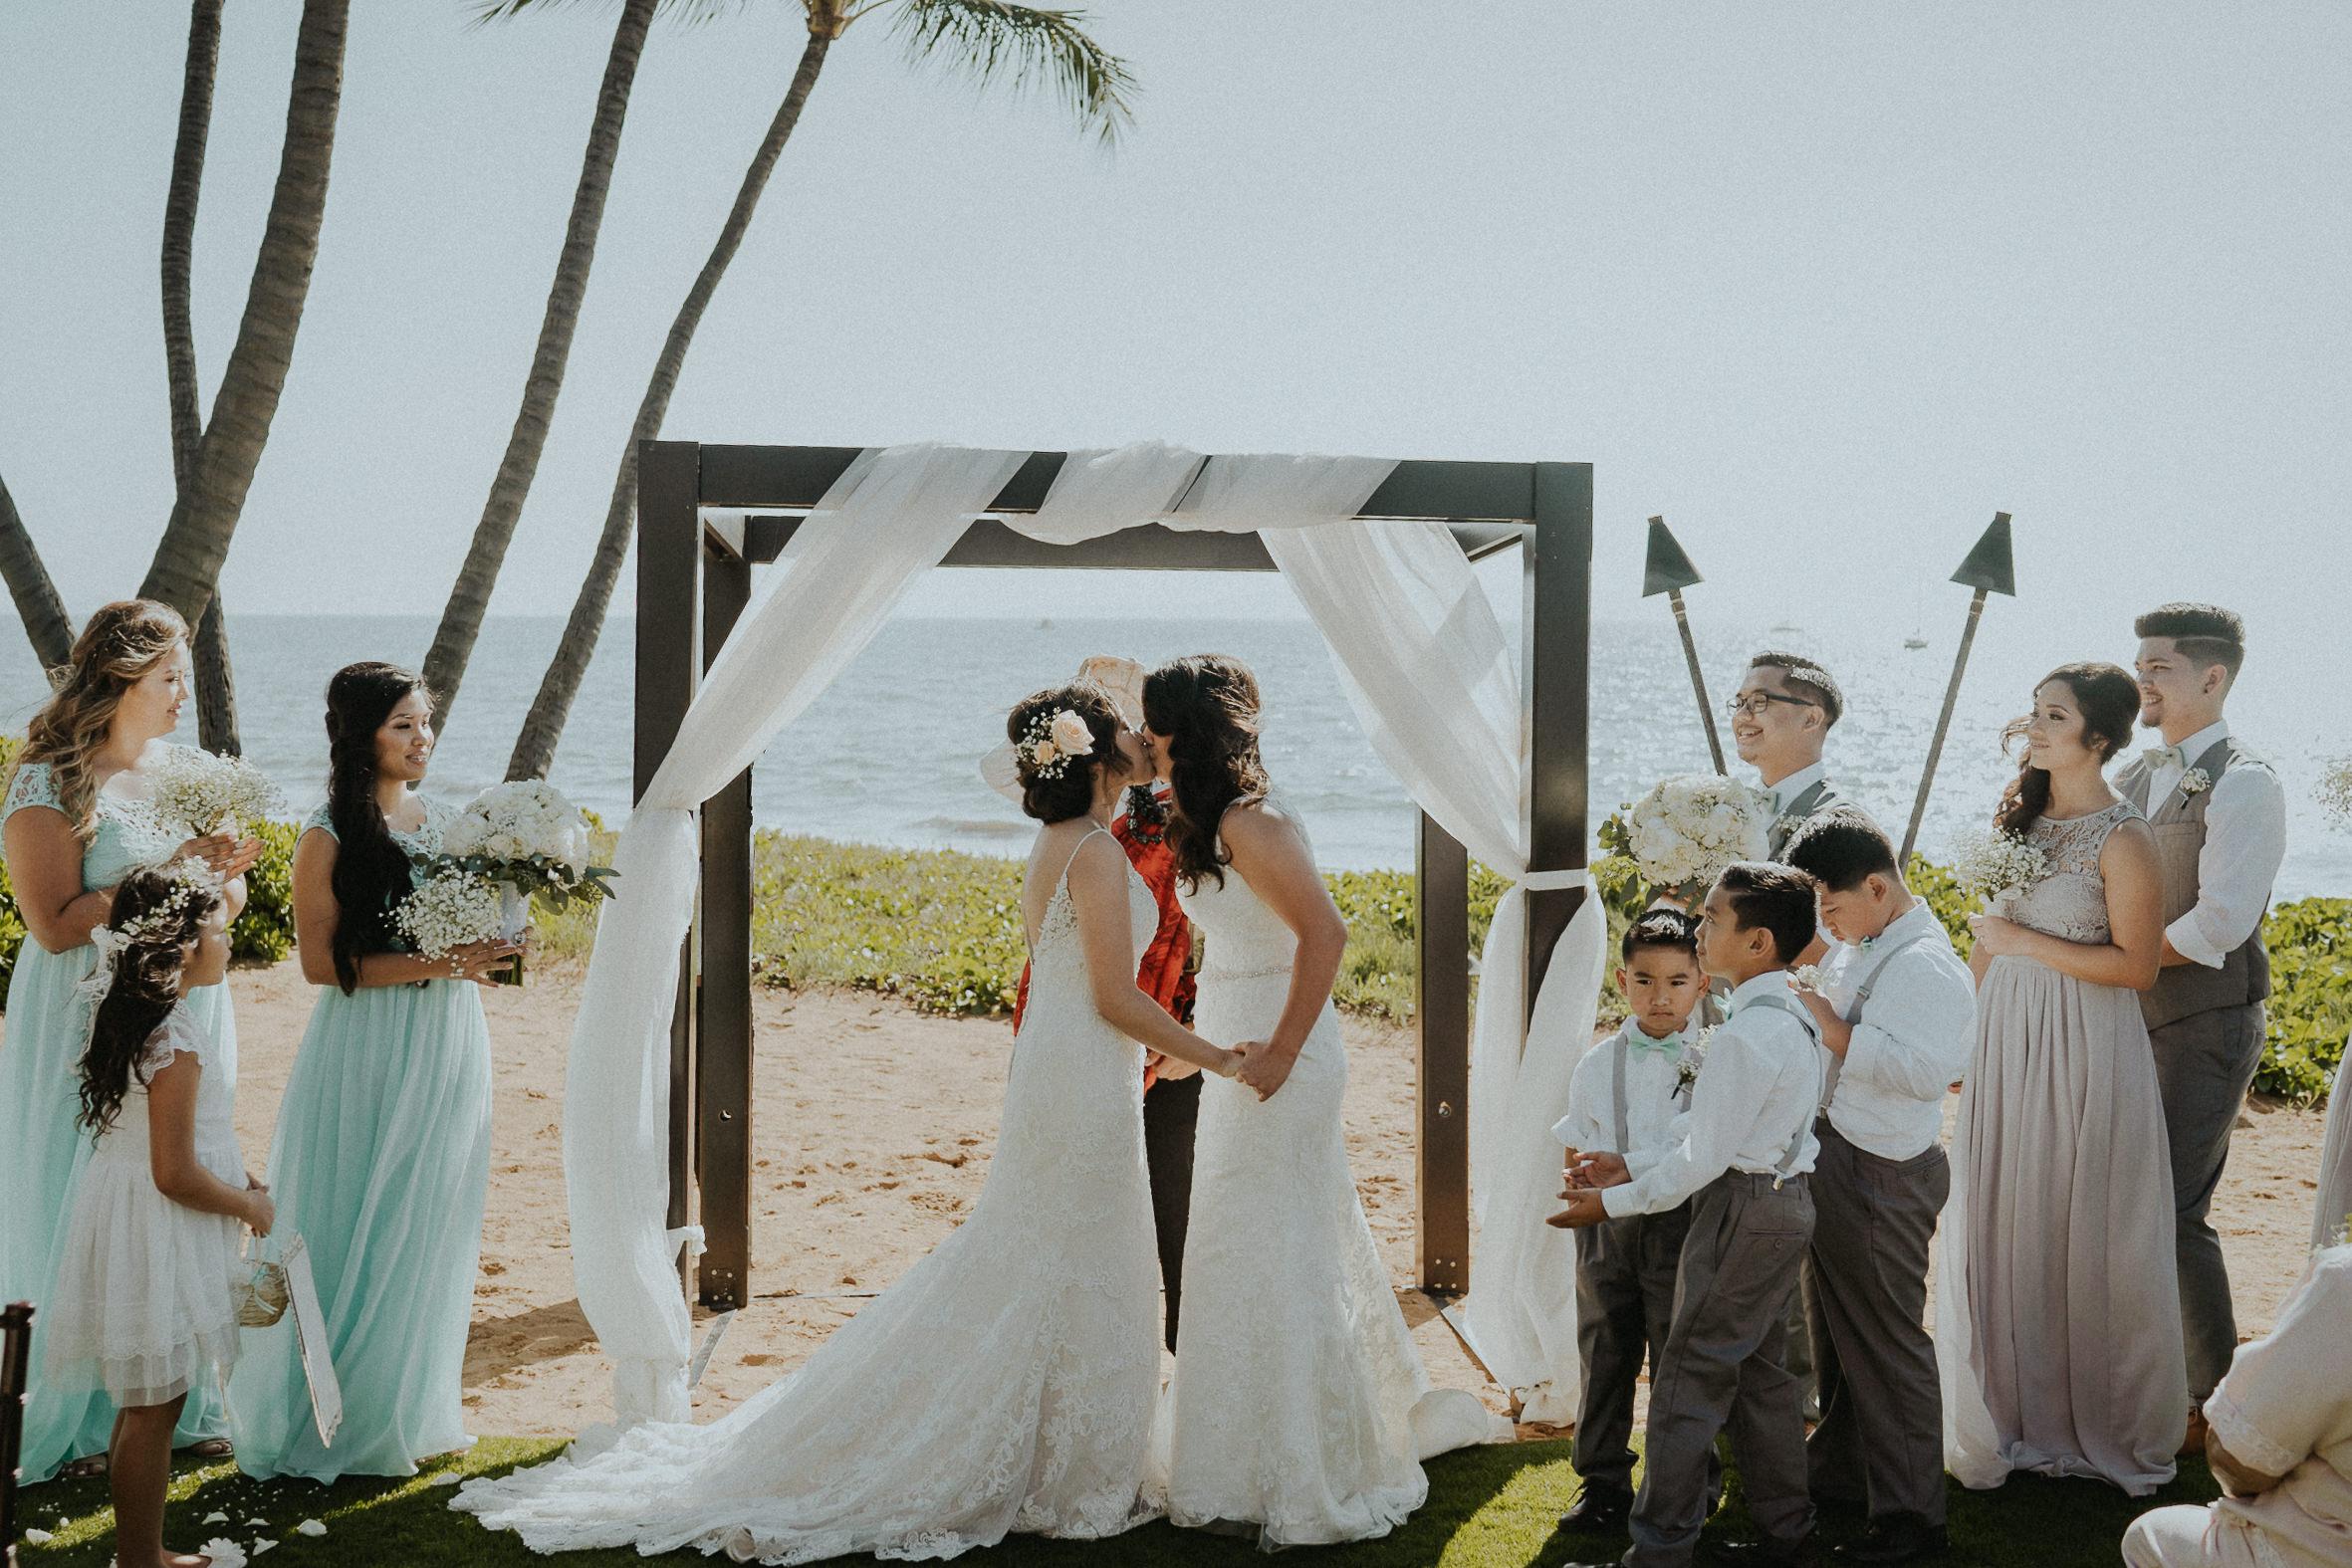 Maui_Destination_wedding_Alfred_Tang-21.jpg